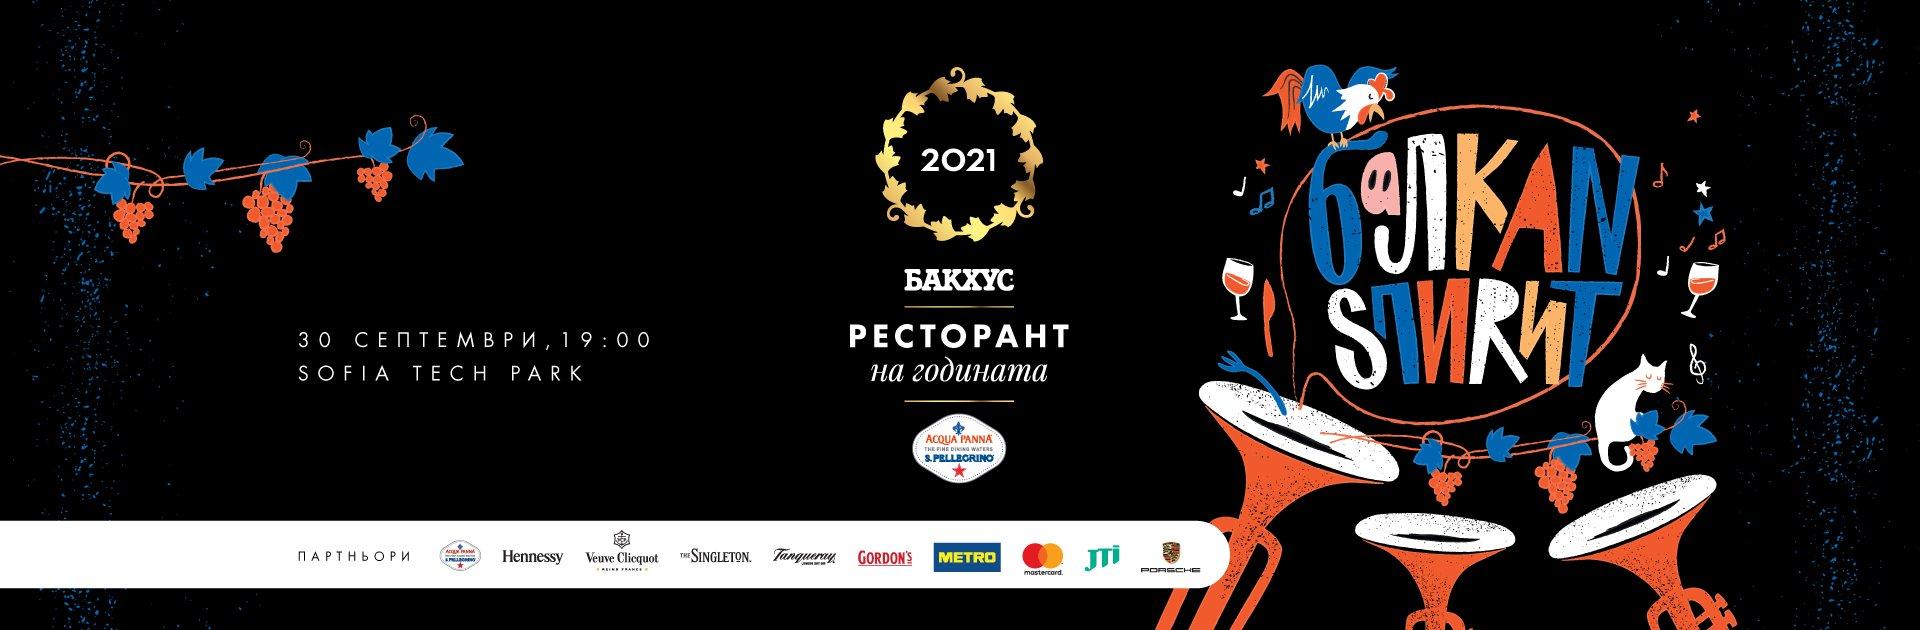 Restaurant of the Year 2021 BACCHUS, Acqua Panna & S.Pellegrino